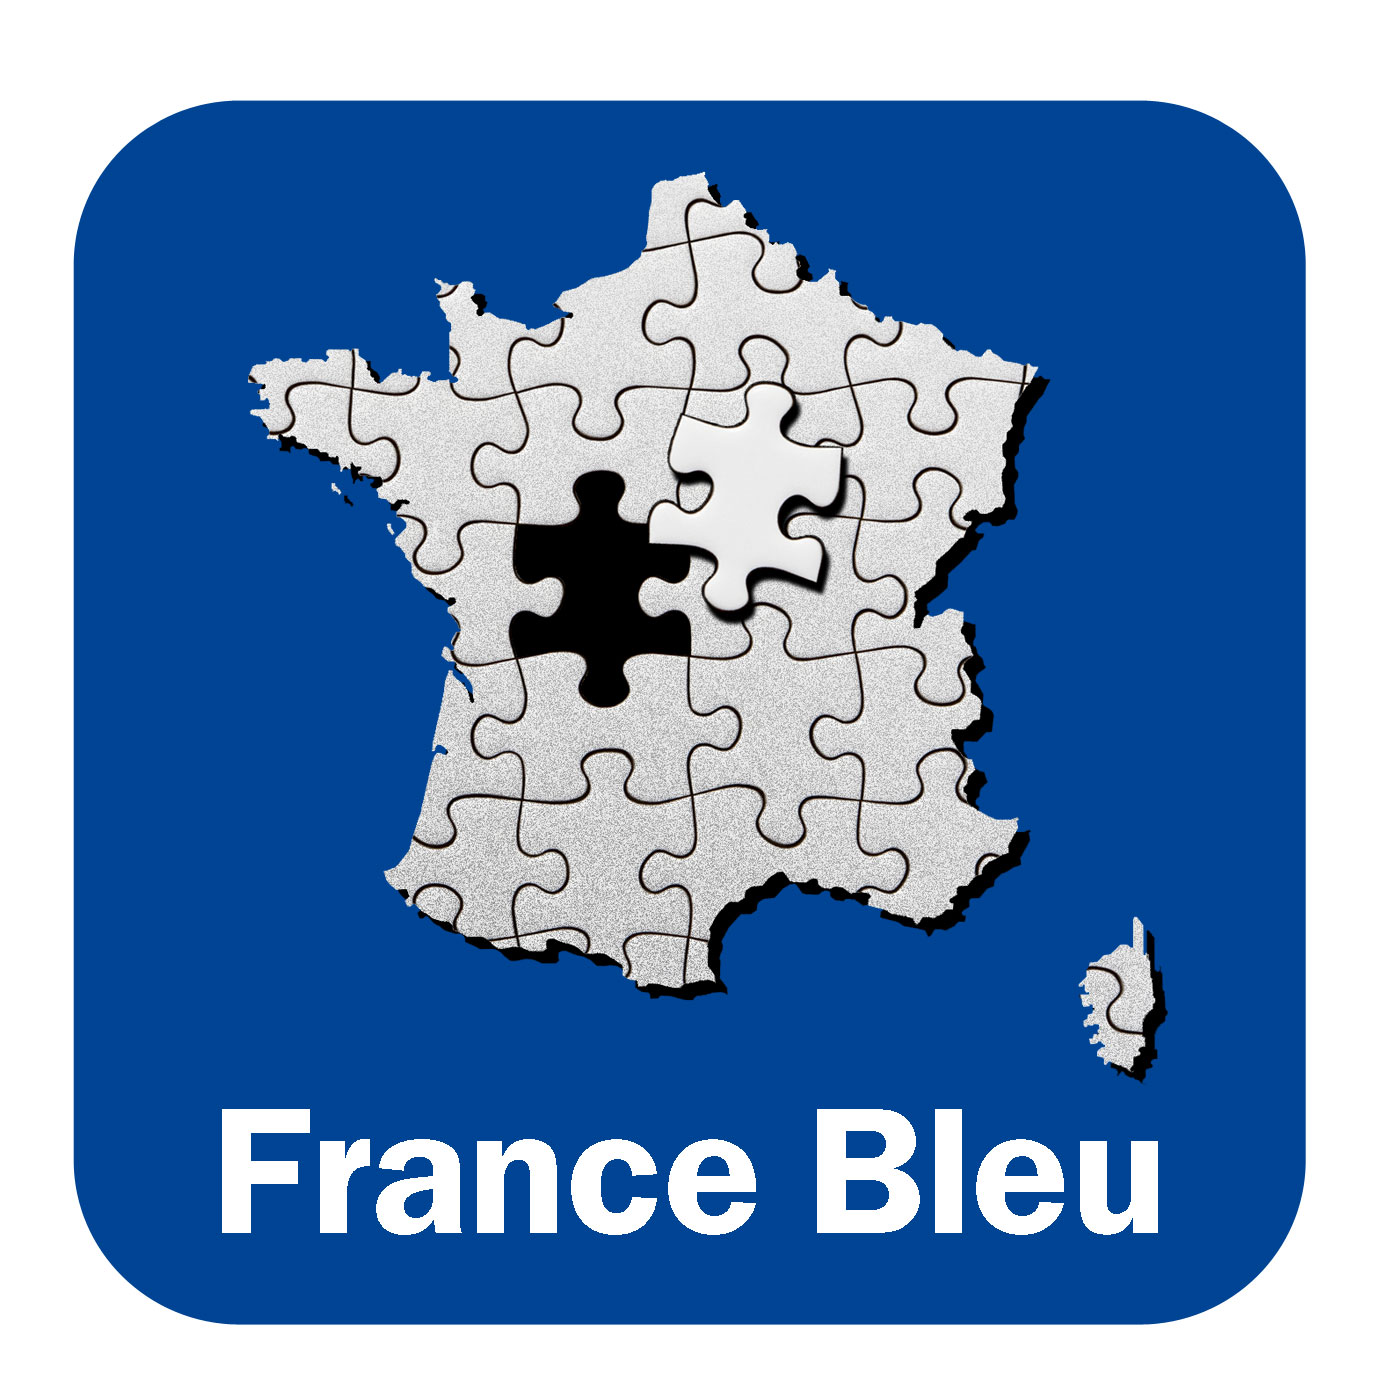 Sortie en Mayenne France Bleu Mayenne